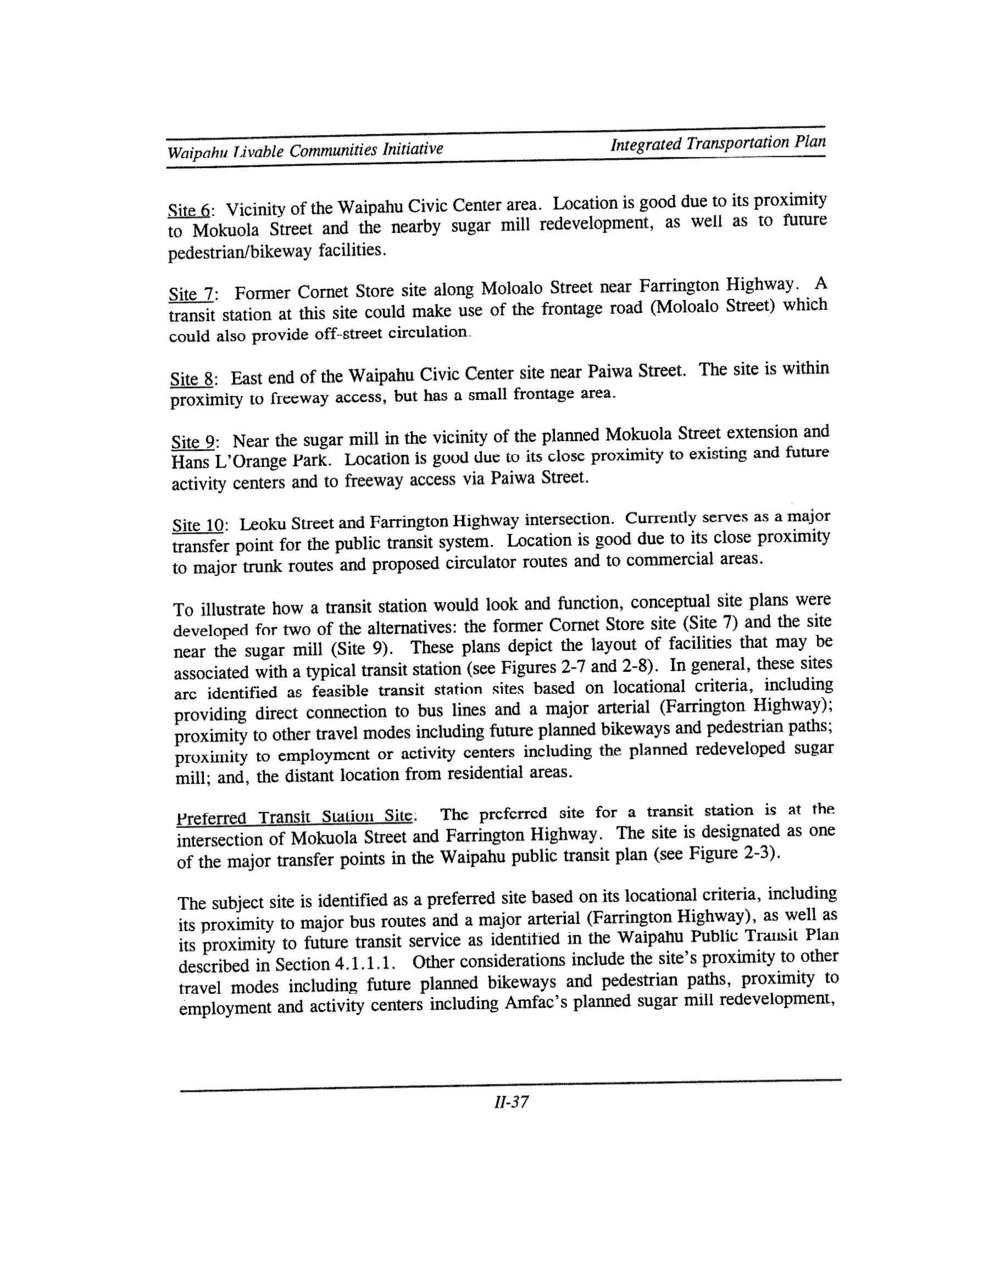 160531_WaipahuLivableCommunities(1998)_Page_052.jpg